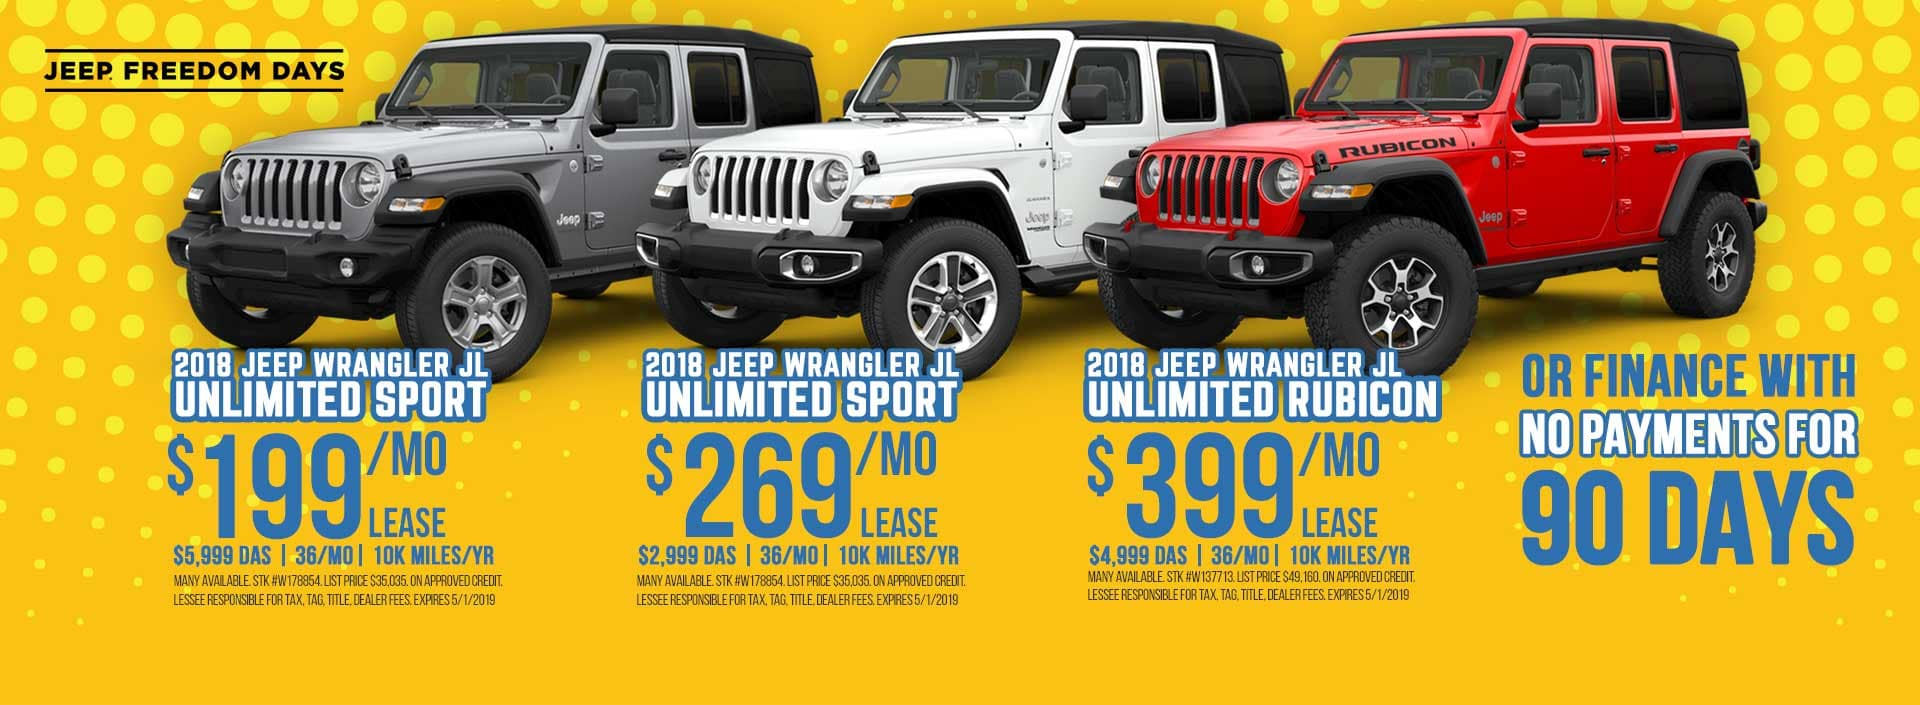 Jeep Wrangler Special Sale